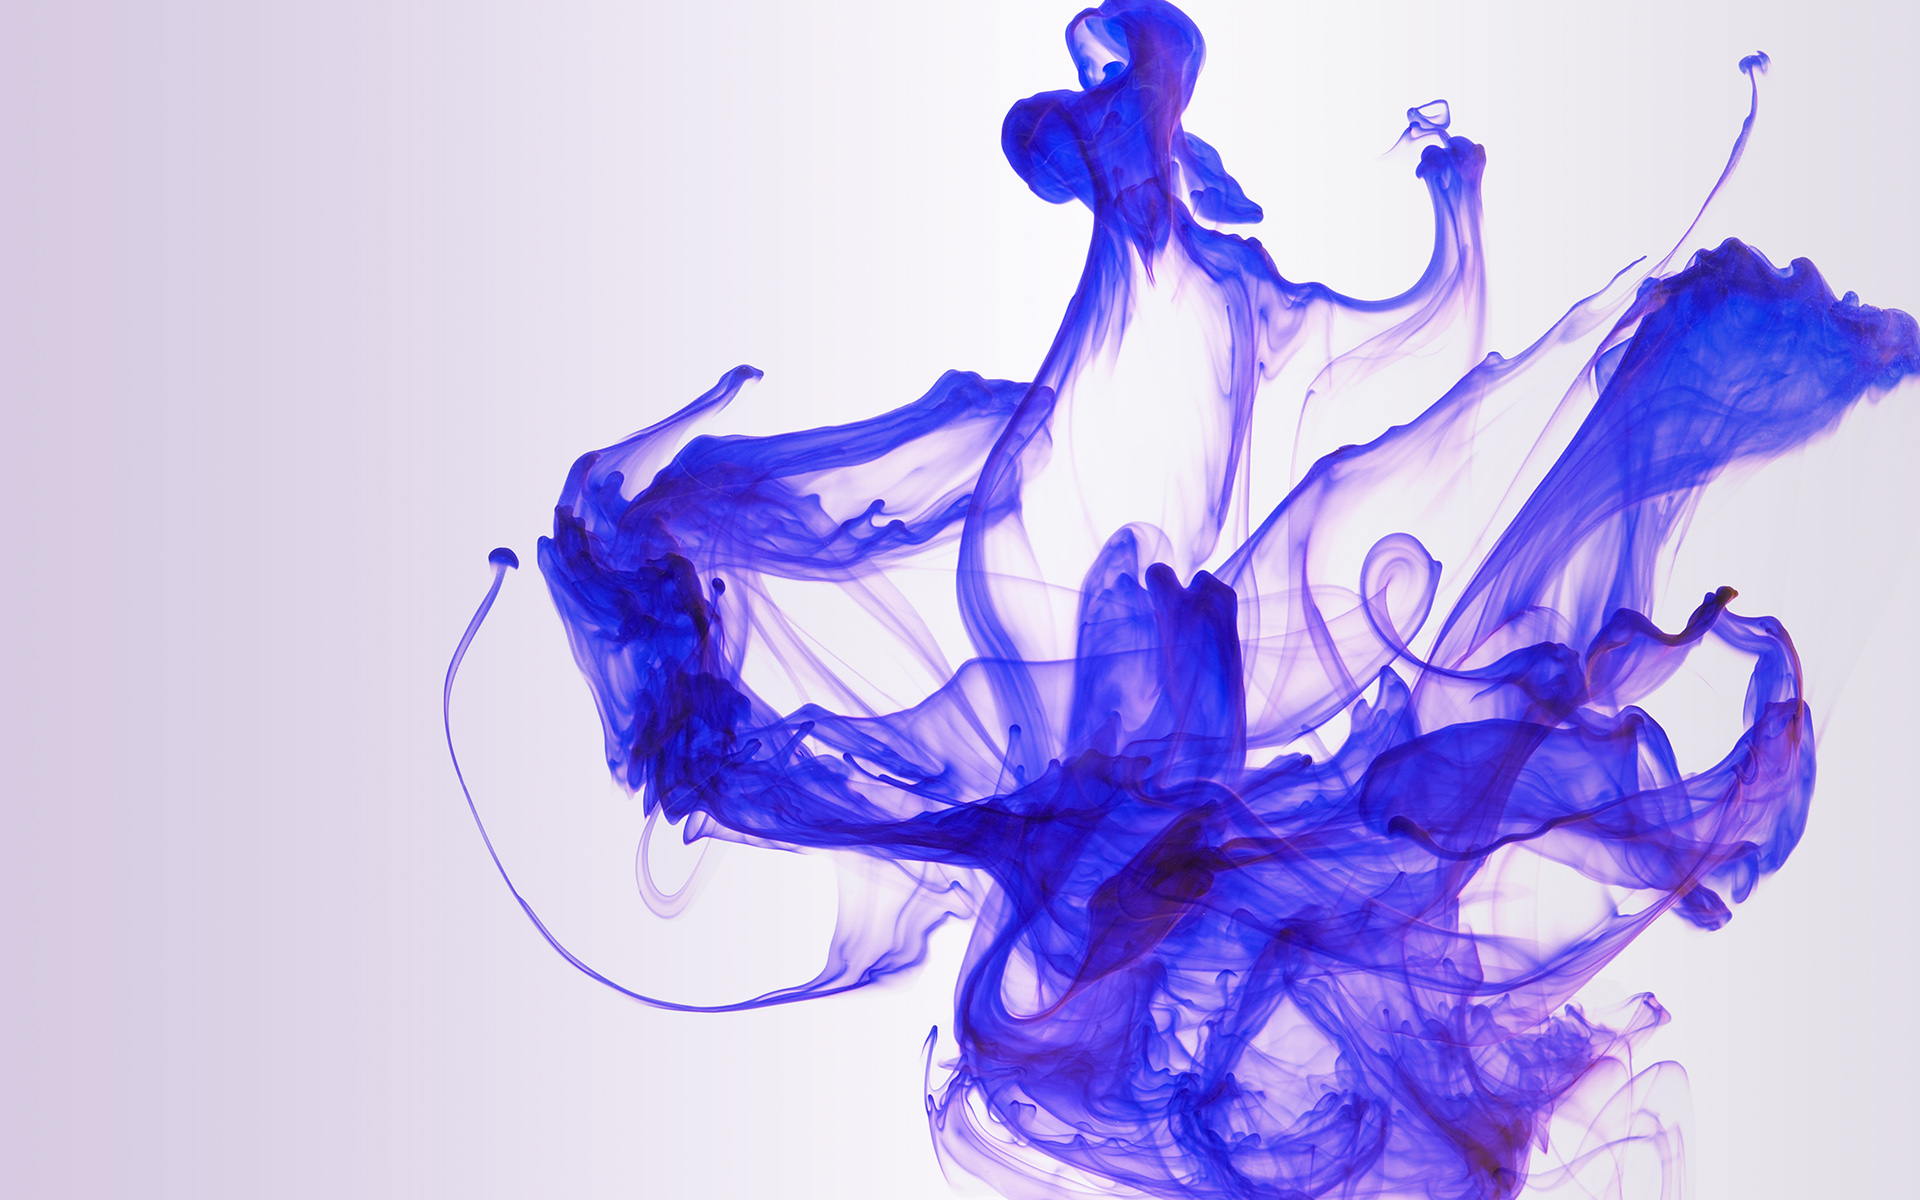 melange-bleu-dans-eau